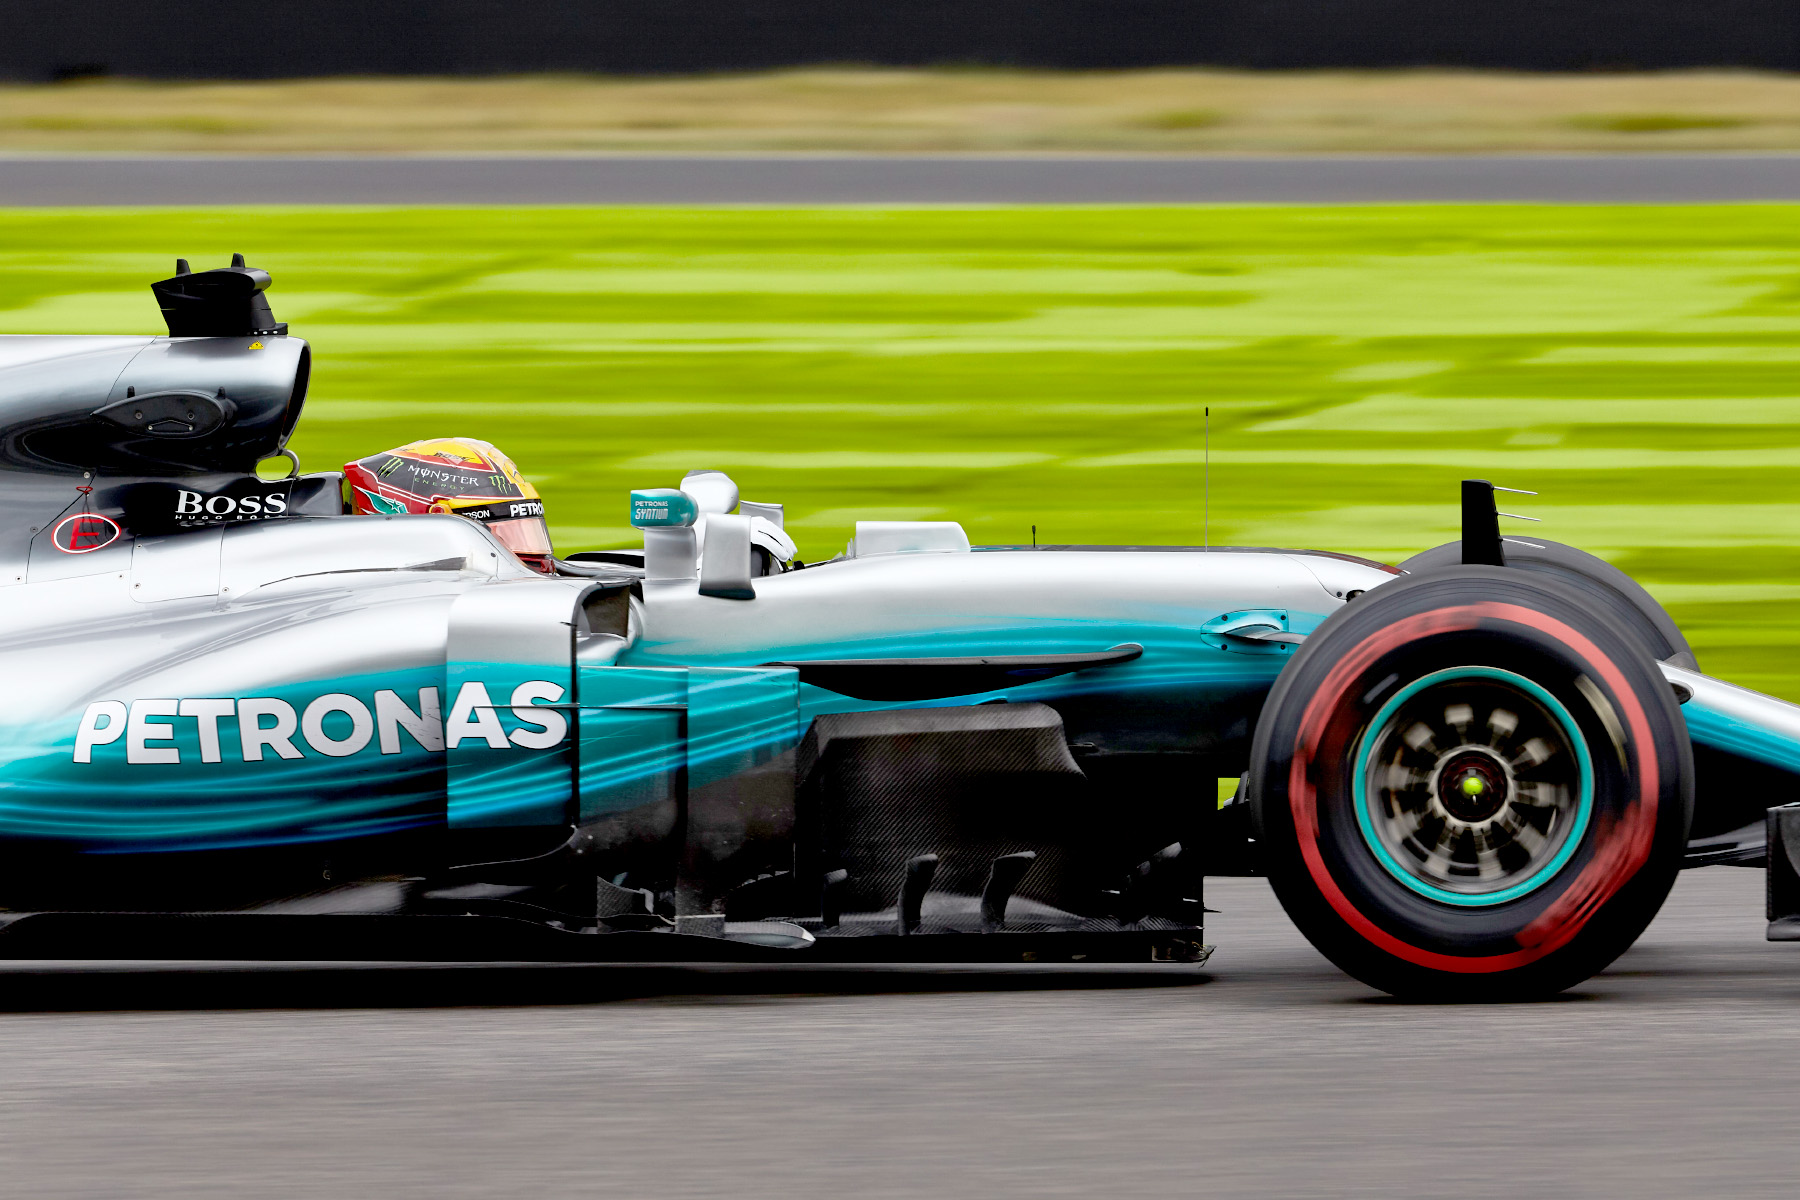 Lewis Hamilton cruises at the 2017 Japanese Grand Prix.